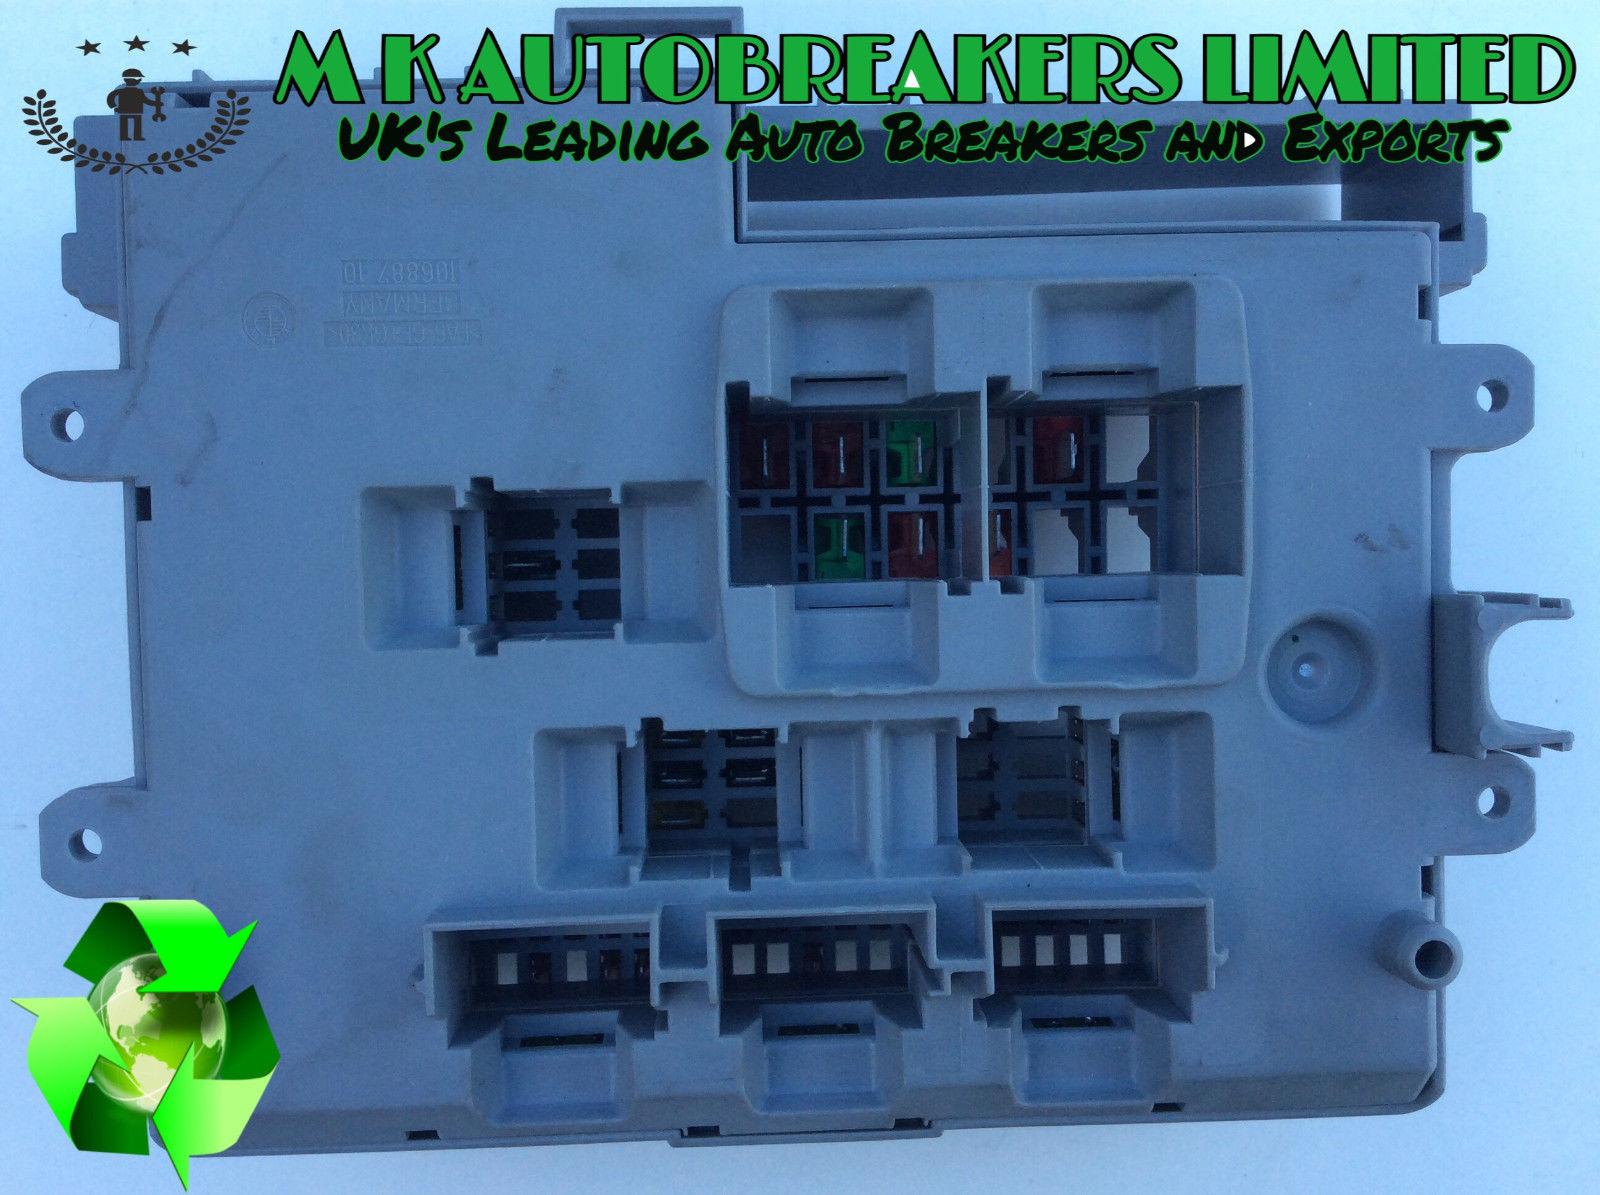 Bmw E90 Fuse Box Diagram Bmw Fuel Pump Wiring Diagram Bmw E46 Fuse Box